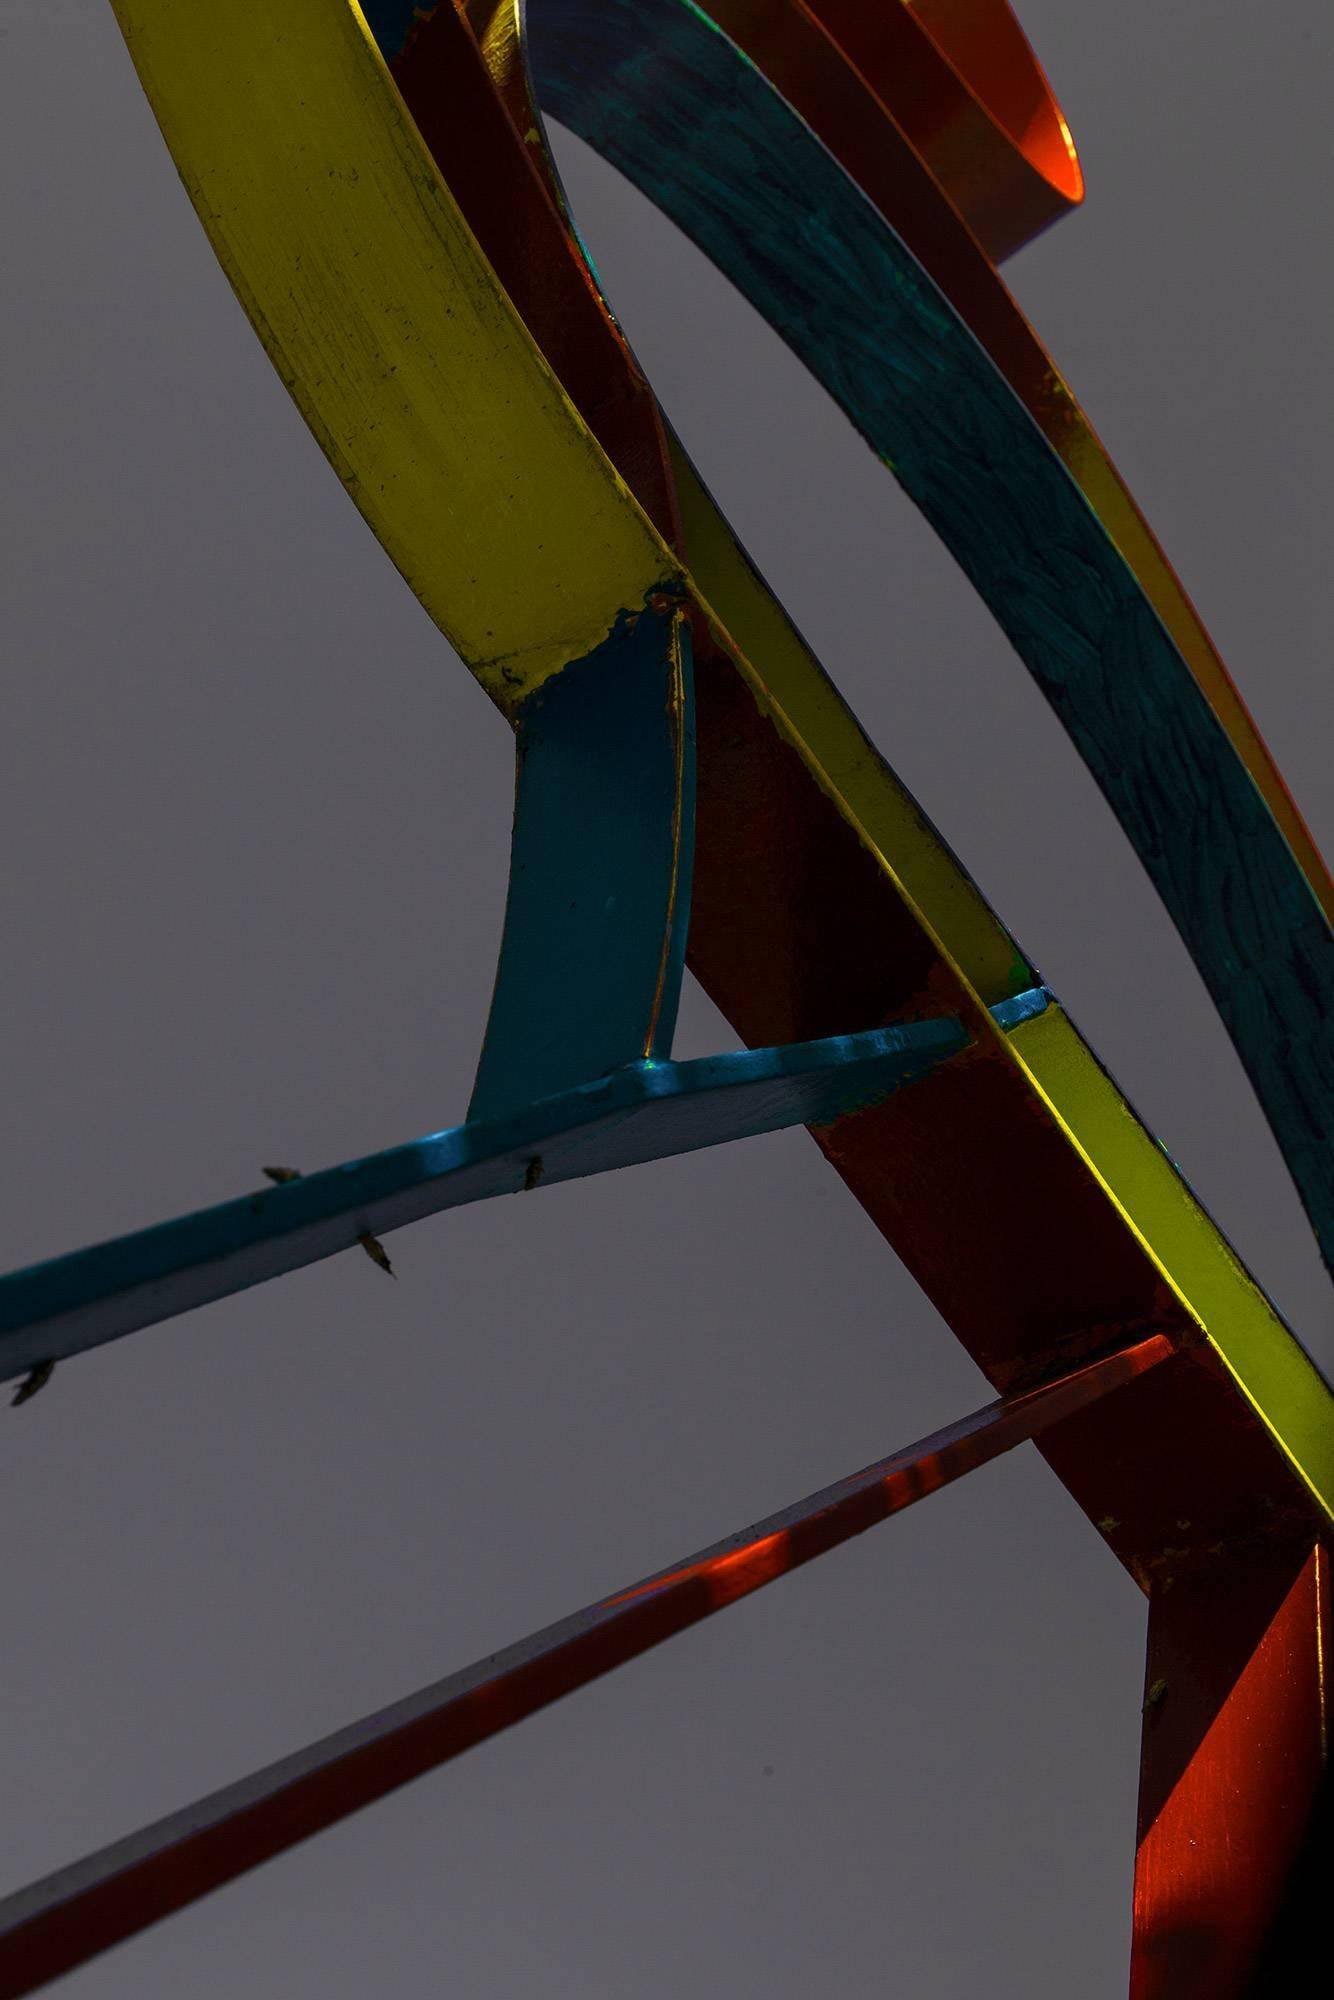 """Flaming 13"", Medium Color Photograph, 2018"